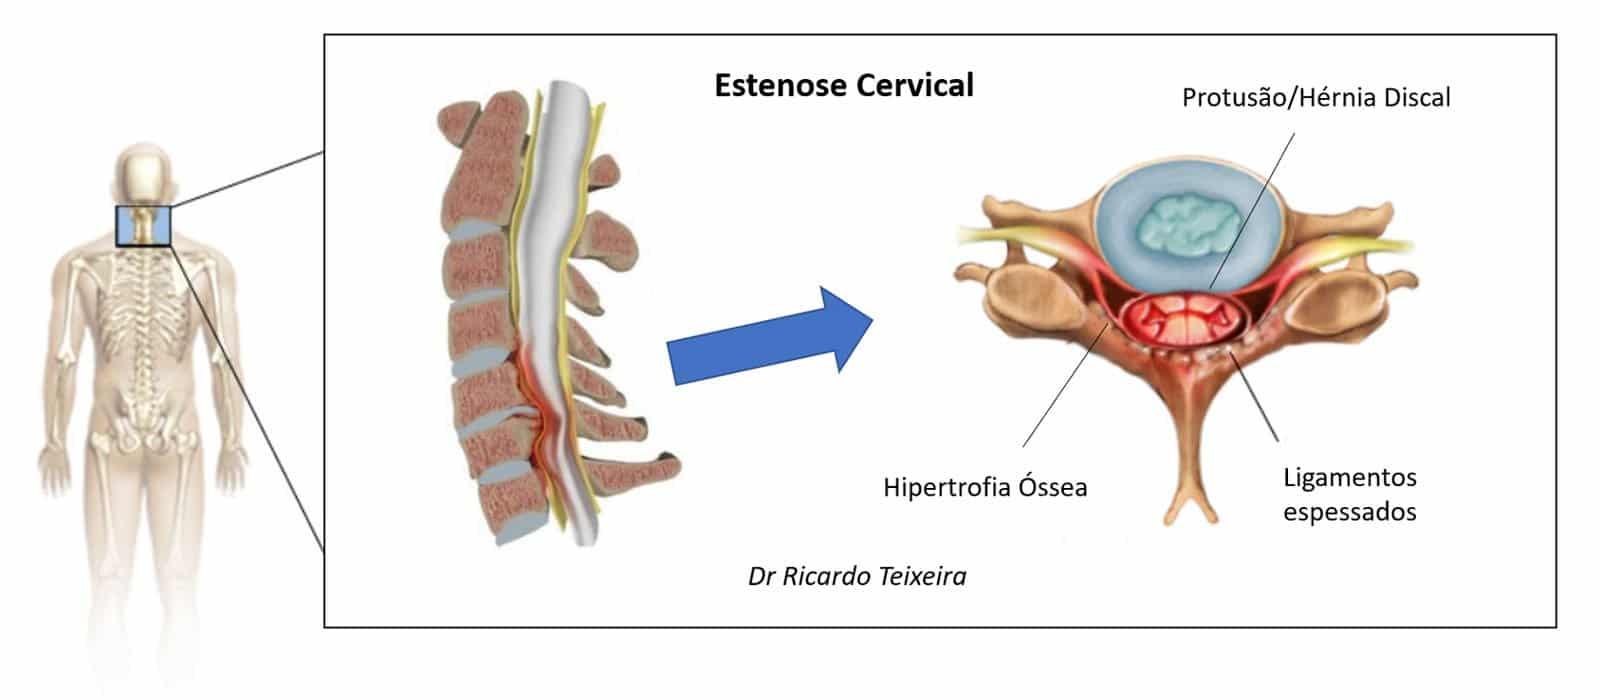 Figura 1 – Estenose Cervical